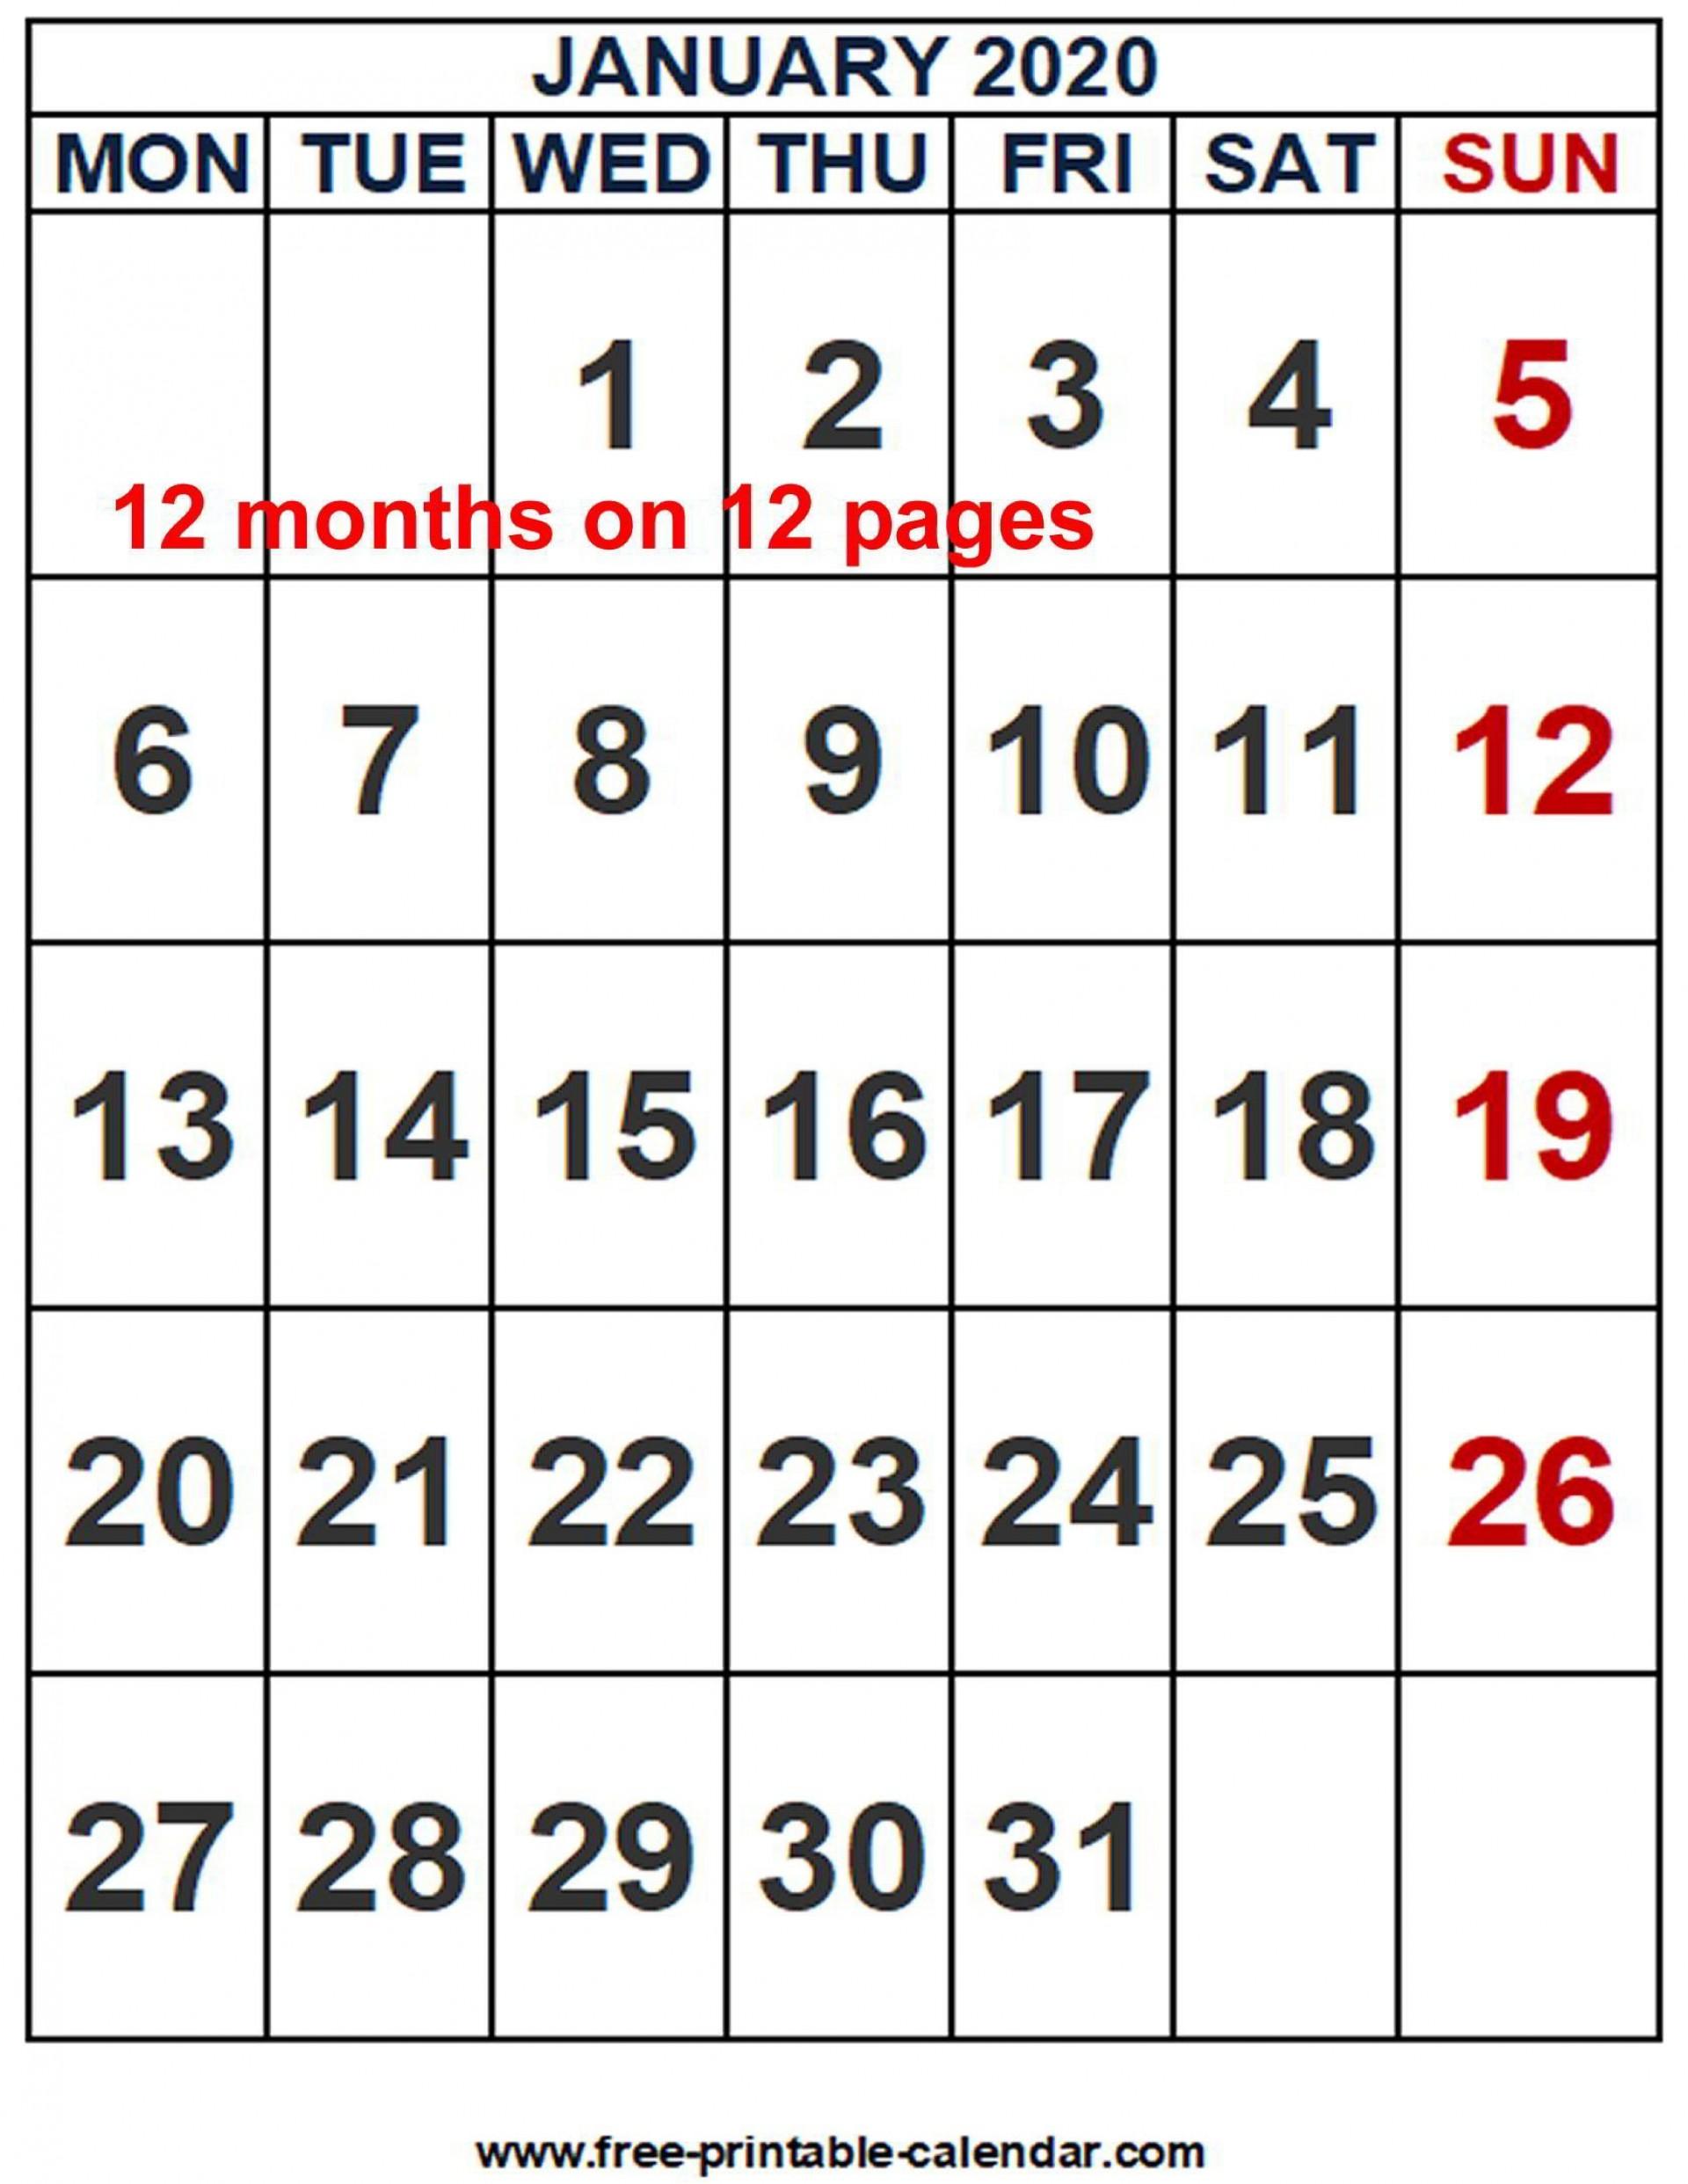 002 Striking Word 2020 Monthly Calendar Template Inspiration  Uk Free1920